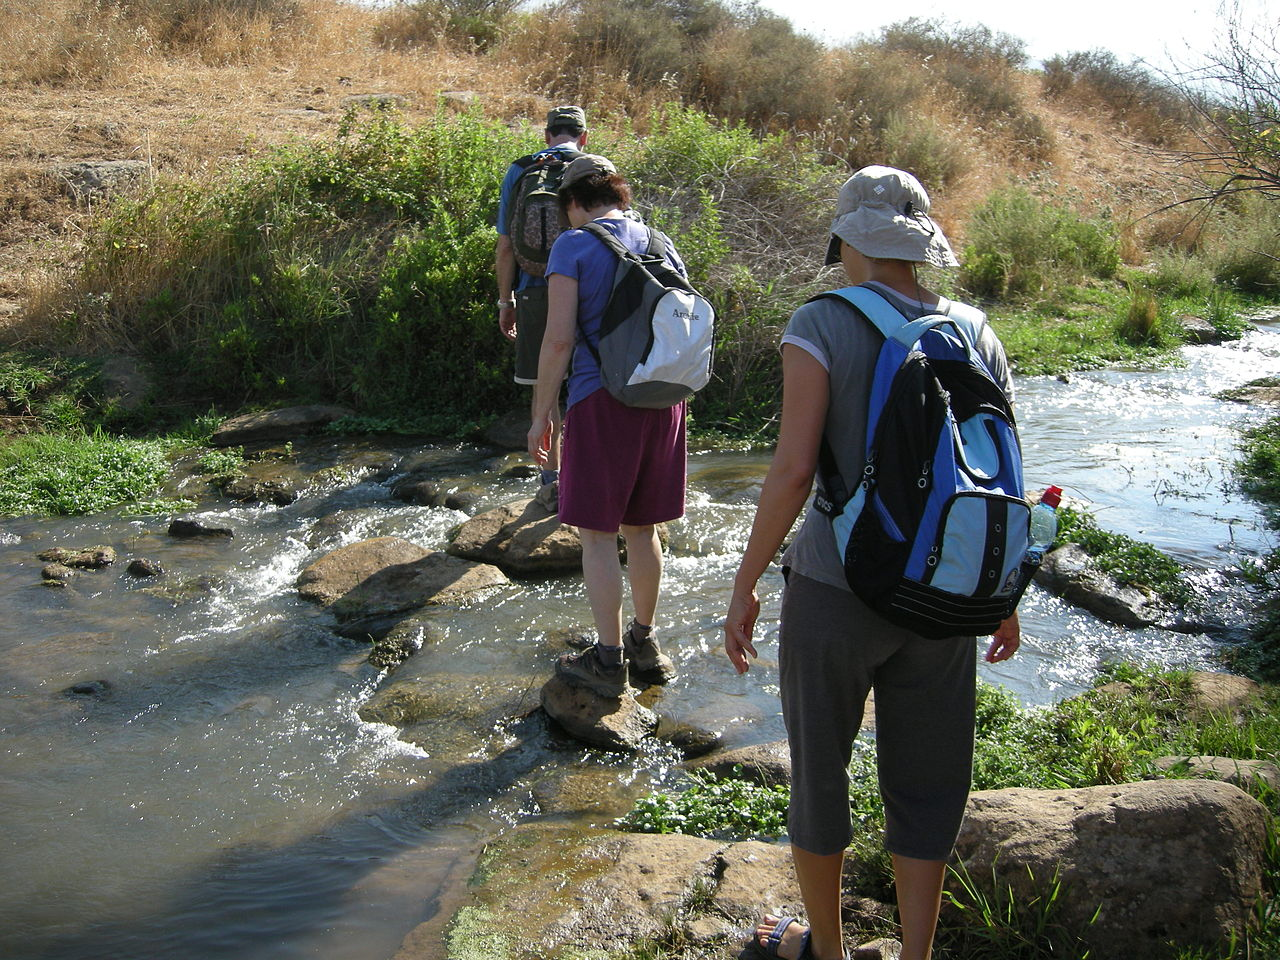 sentiero nazionale di israele, Israel National Trail